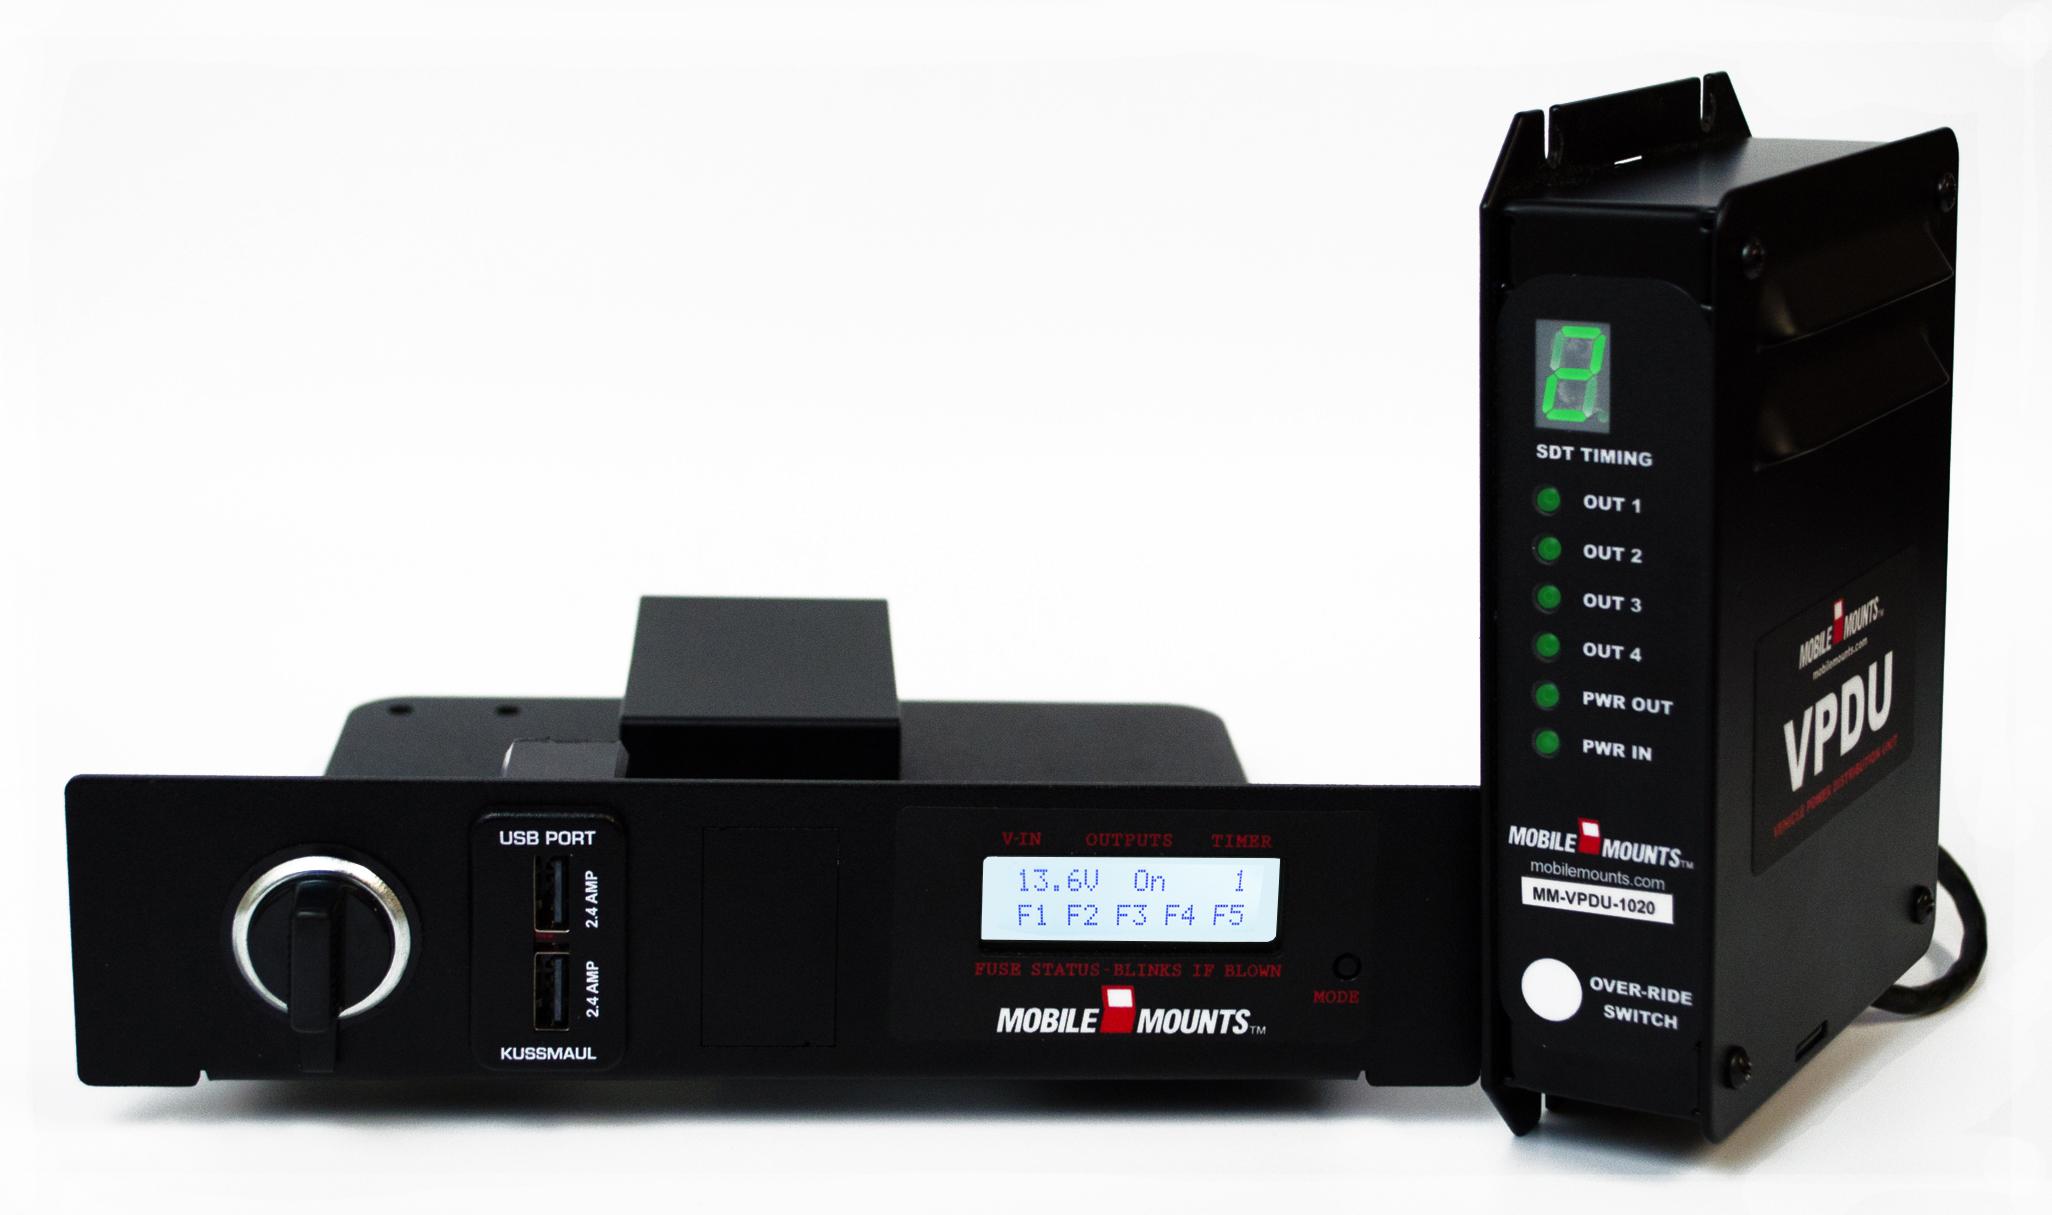 Mobile Mounts Remote VPDU Display